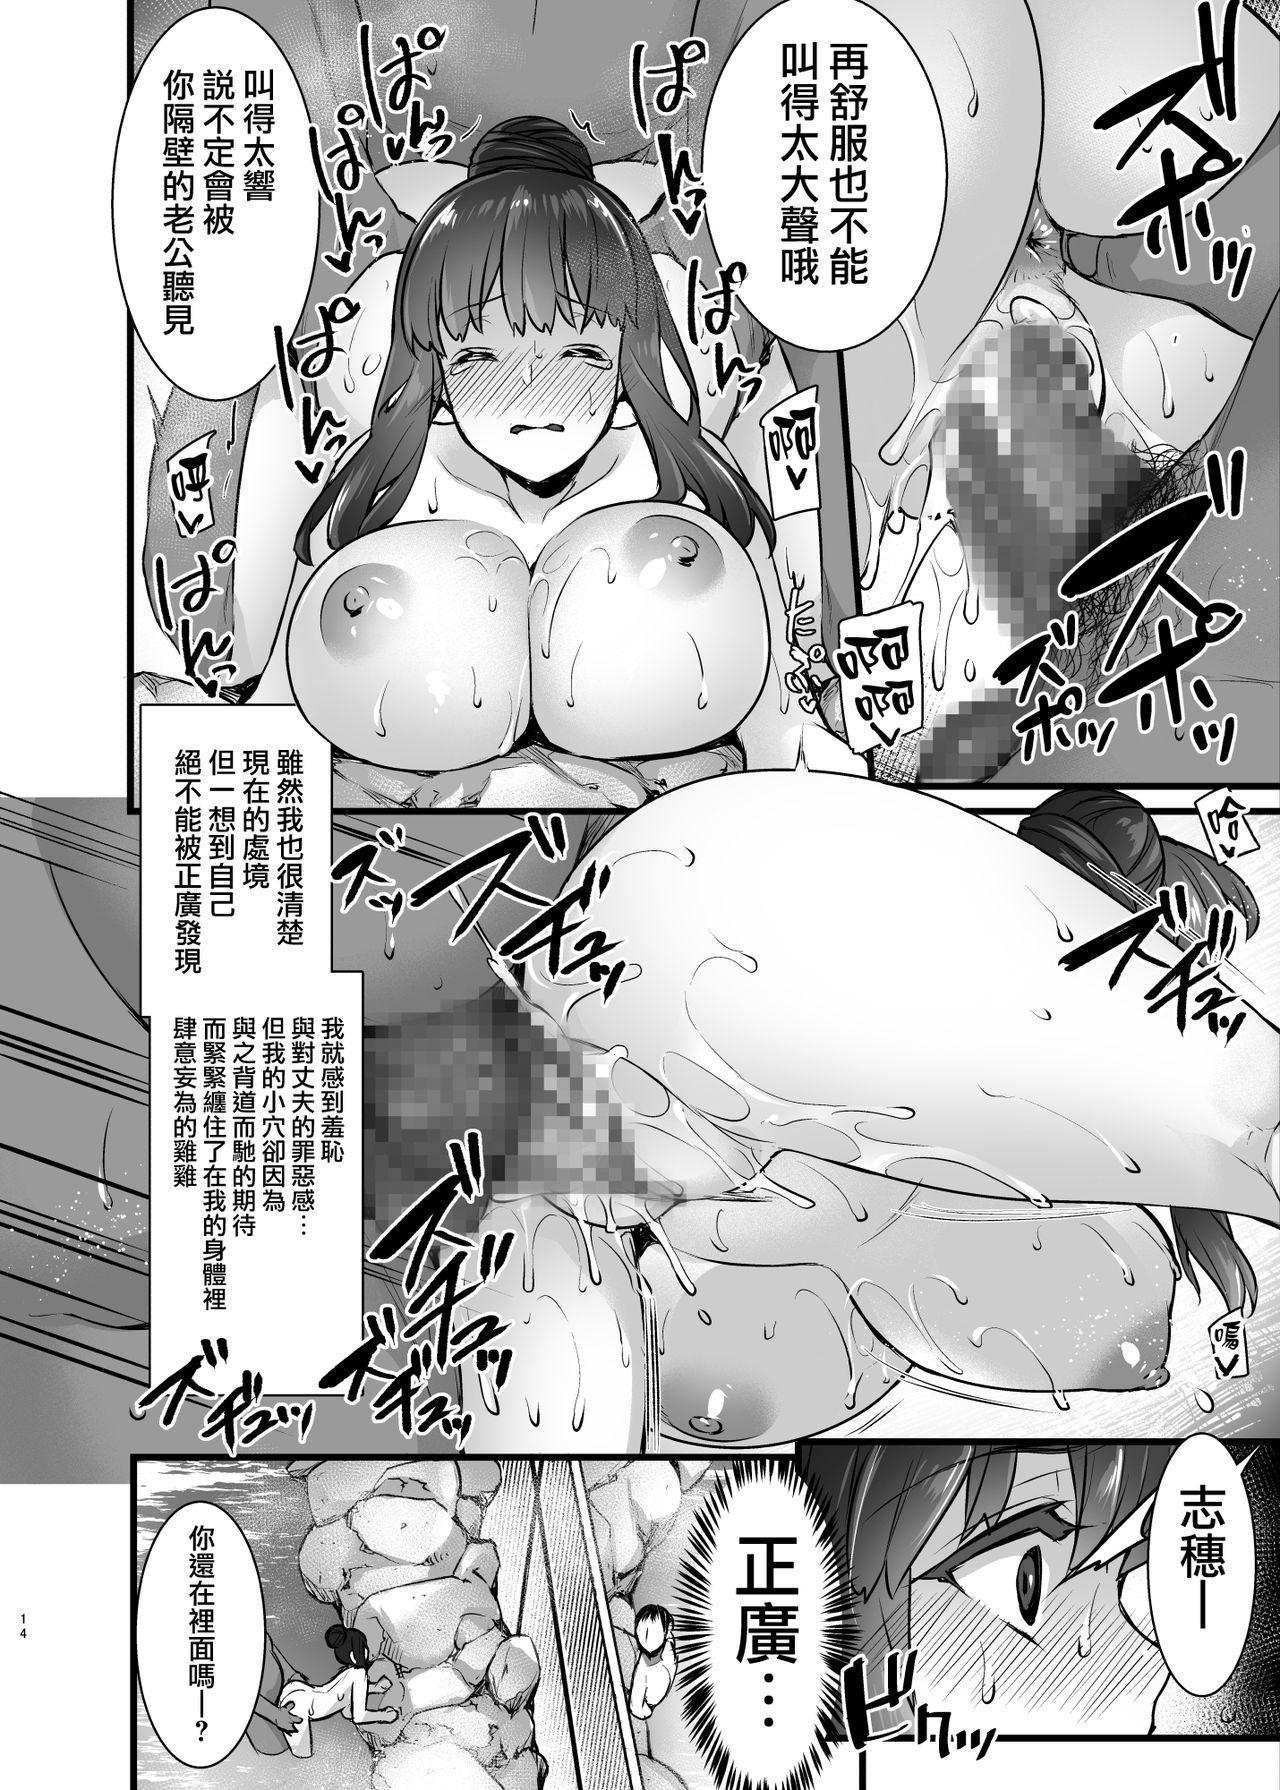 Rental Tanetsuke Oji-san 2 After 12